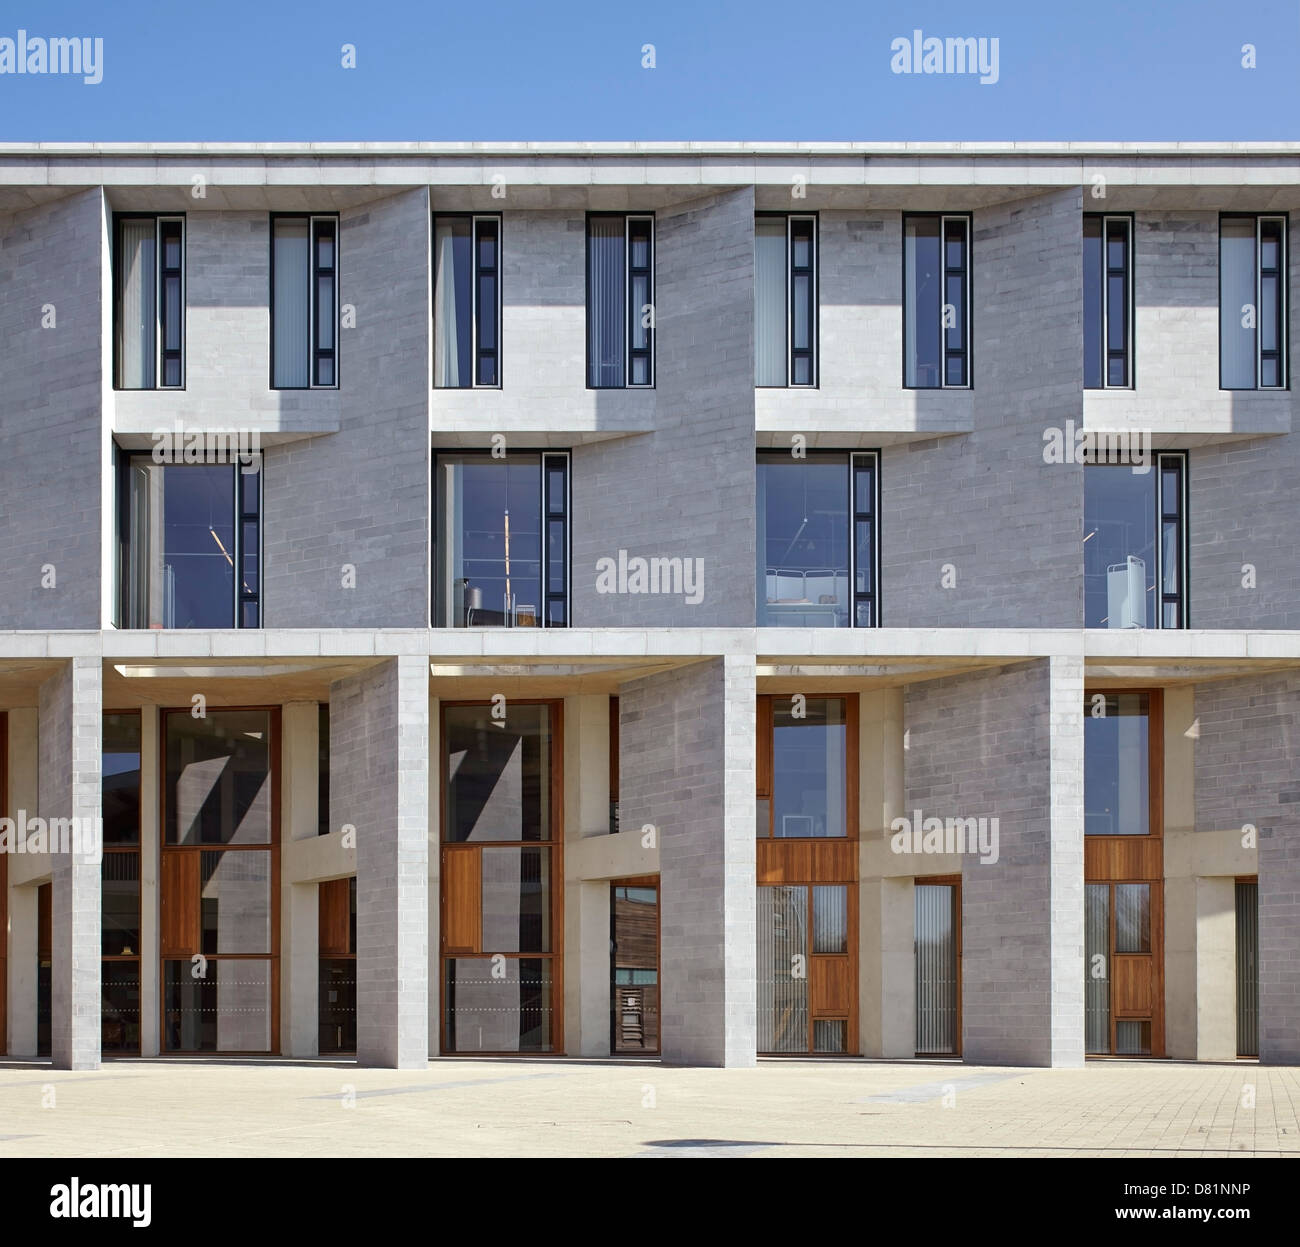 Medical School Building and Student Accommodation University Limerick, Limerick, Ireland. Architect: Grafton Architects, - Stock Image